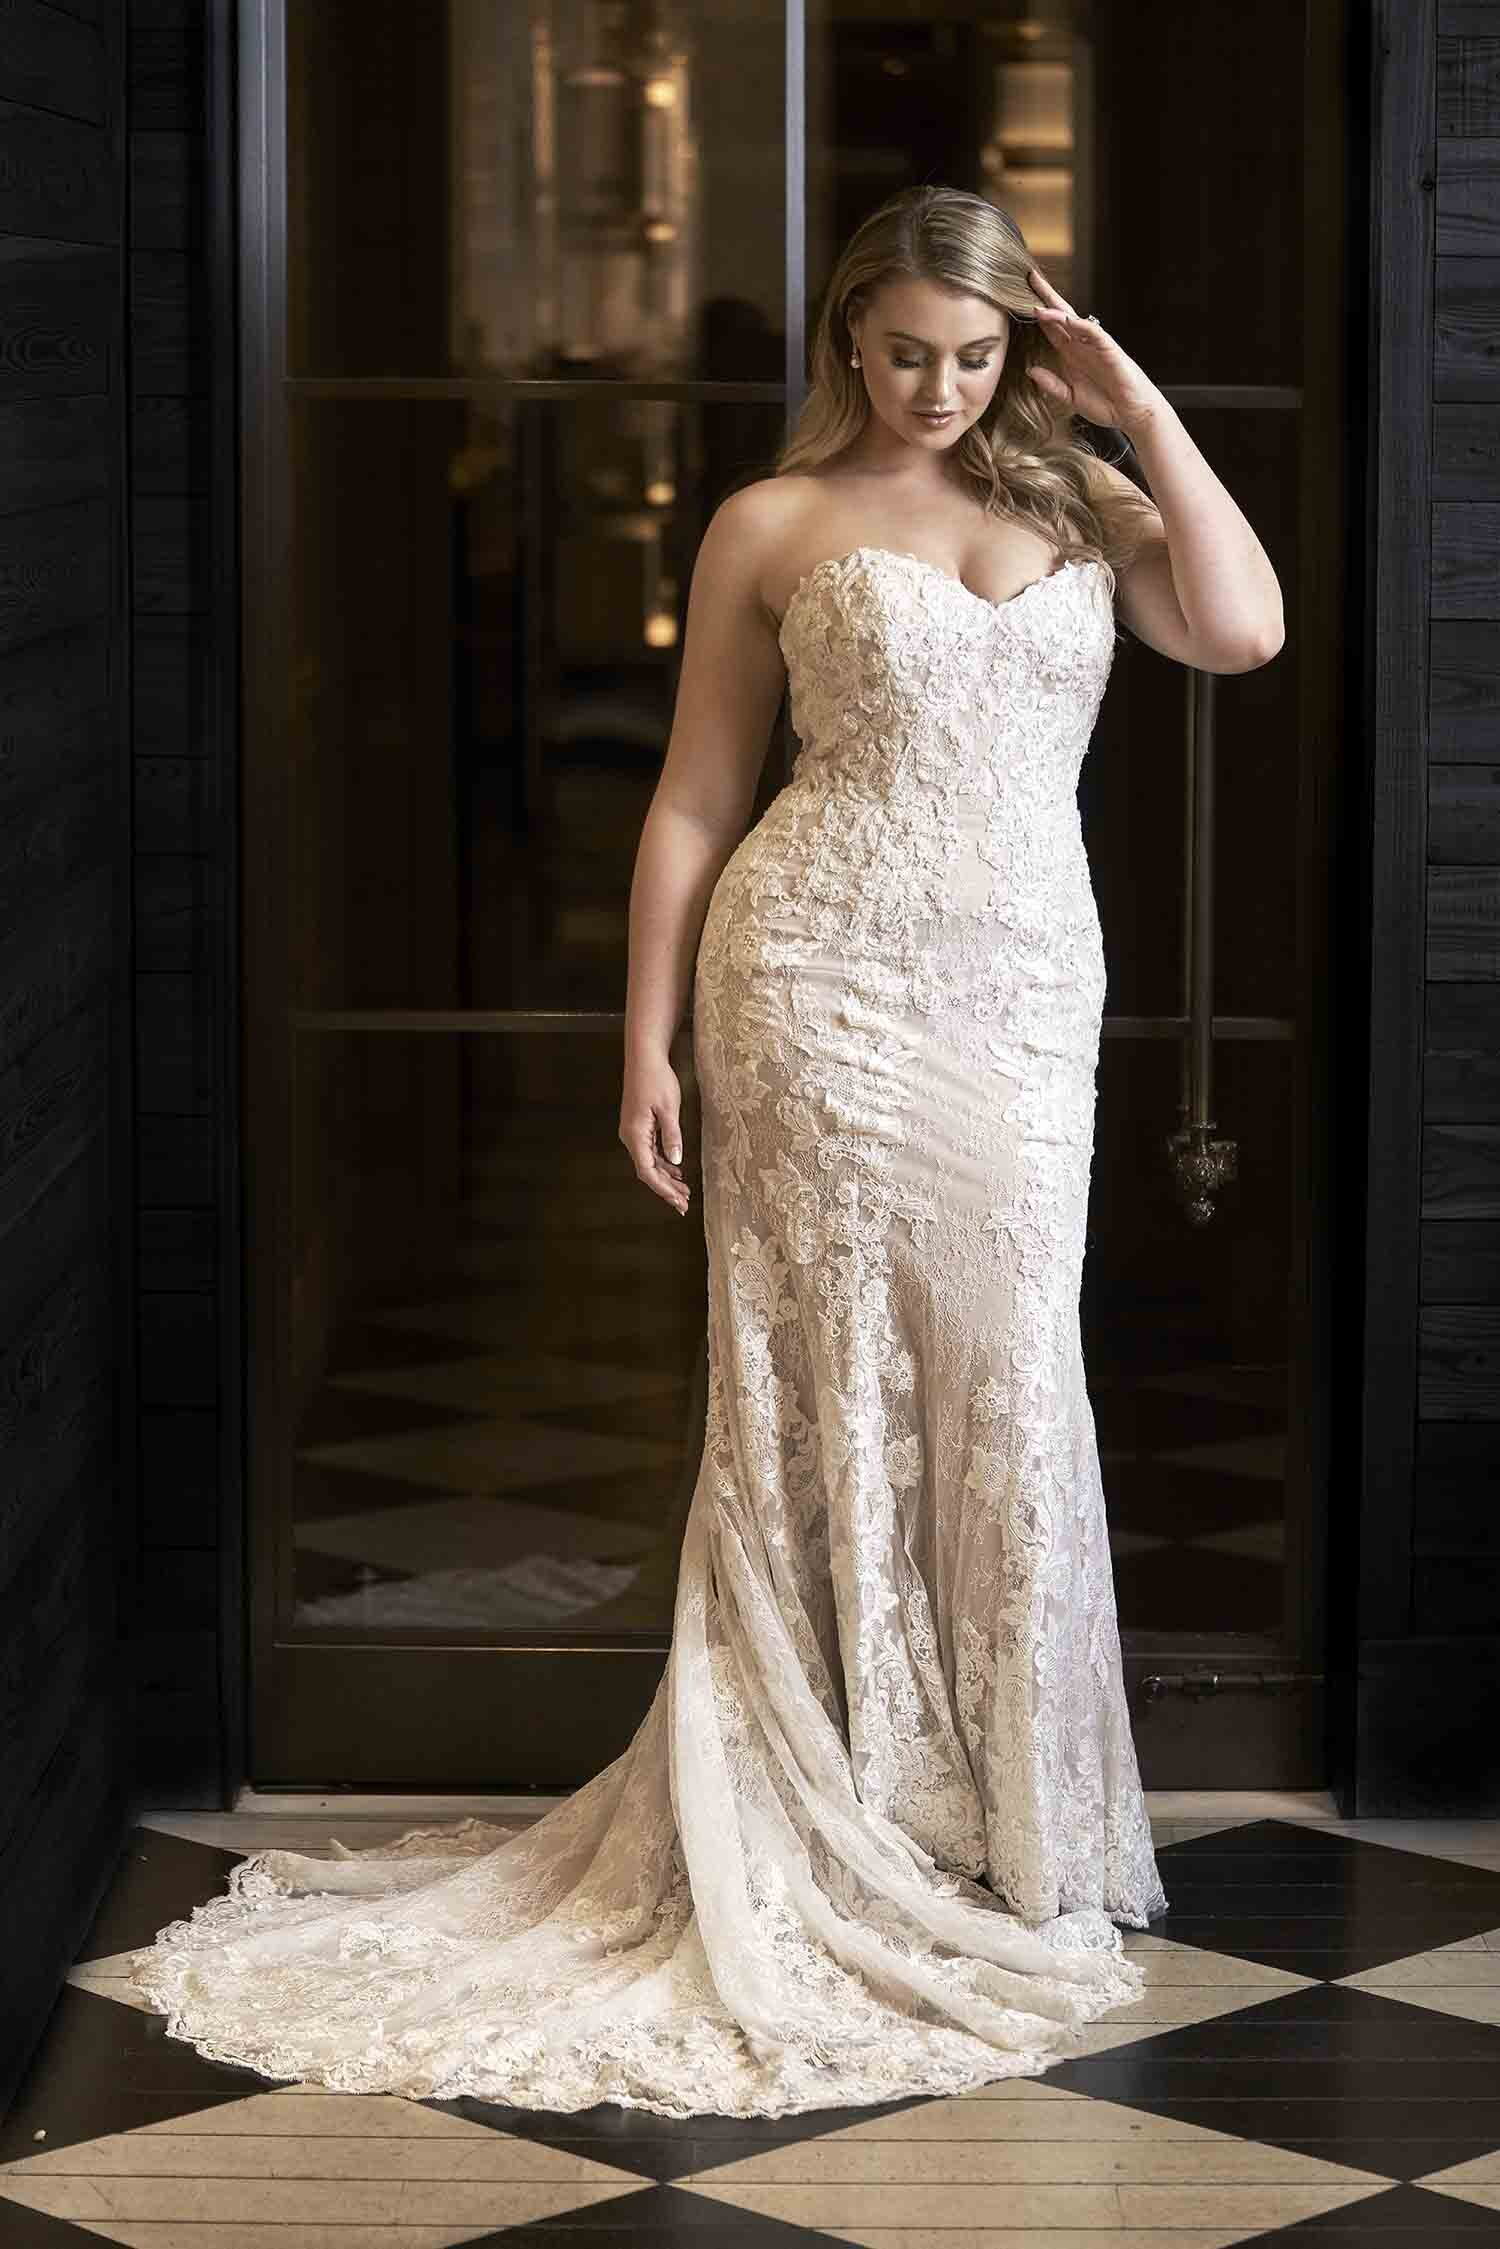 Plus Sized Wedding Gowns Uptown Bride